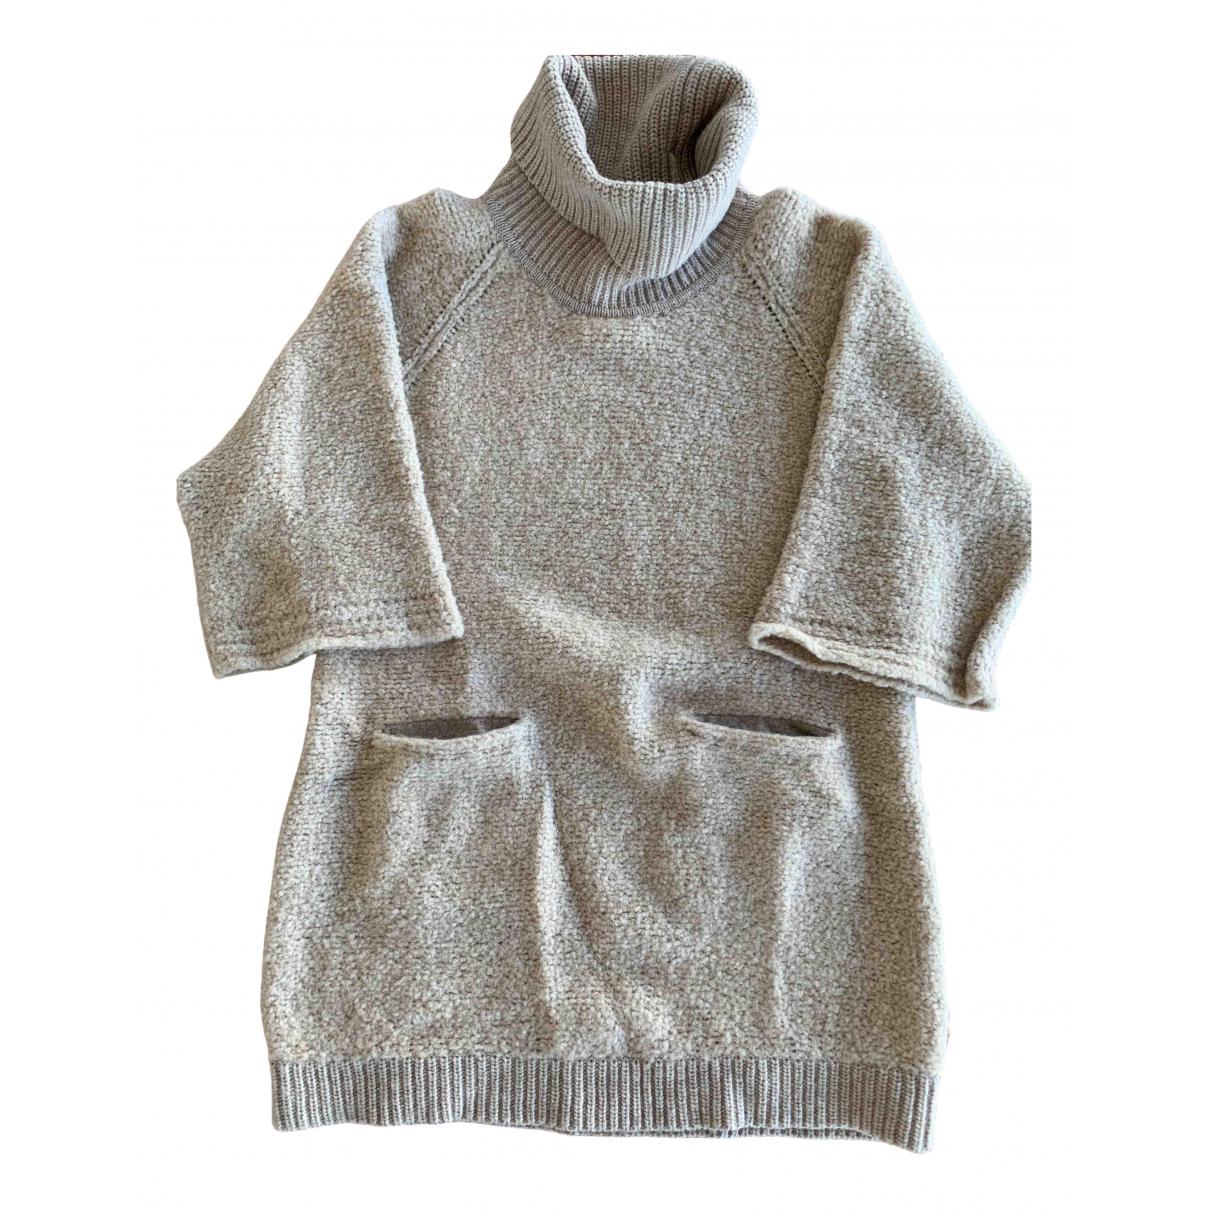 3.1 Phillip Lim \N Pullover in  Kamel Wolle